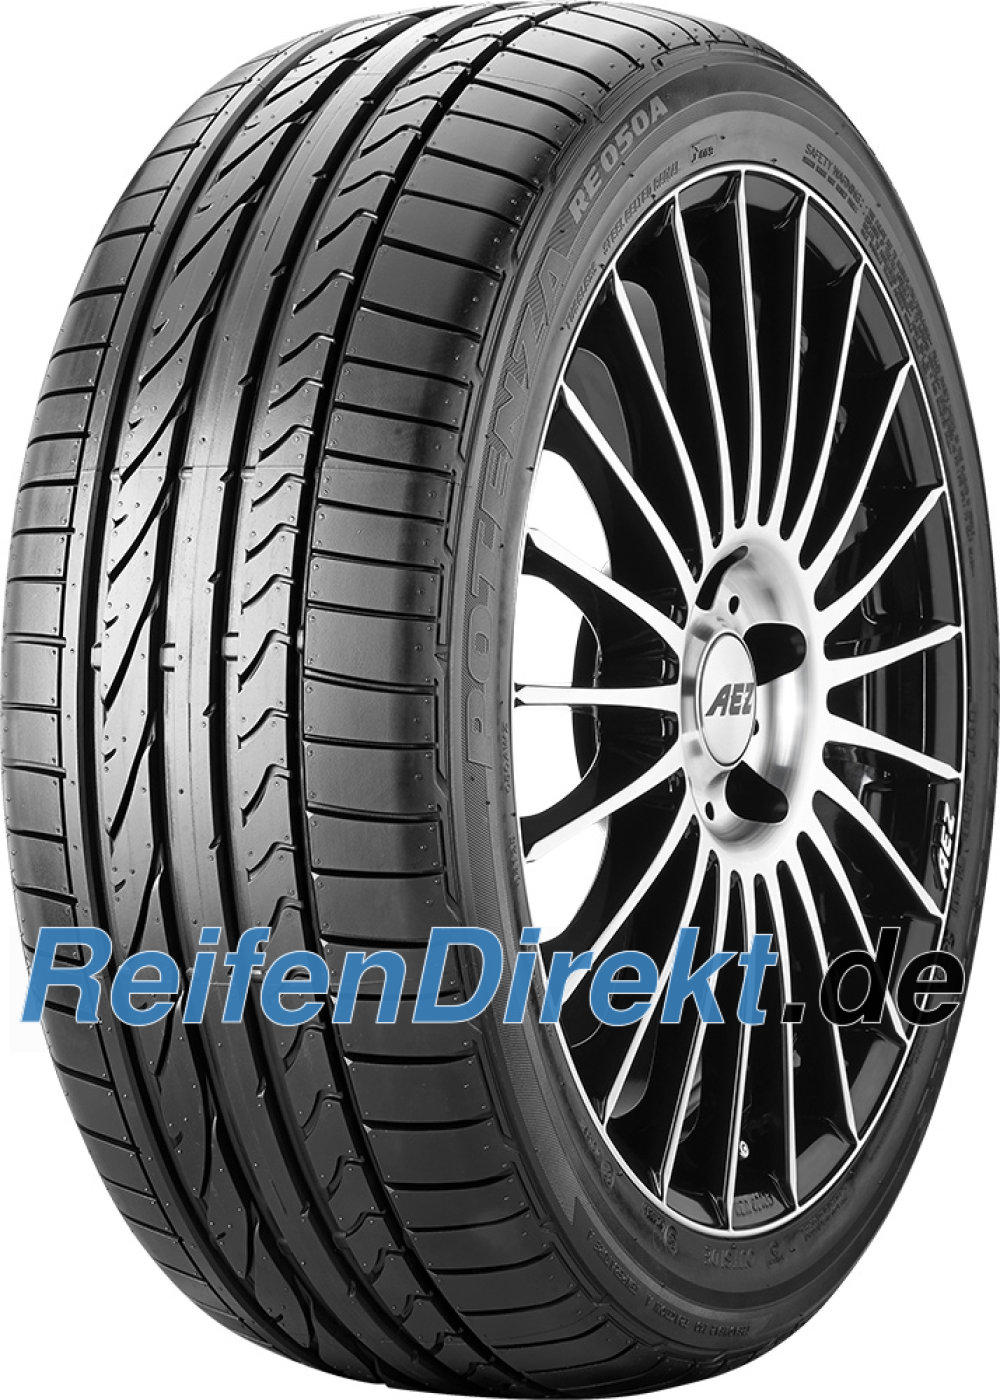 Bridgestone Potenza RE 050 A ( 285/30 ZR19 98Y XL MO1, mit Felgenschutz (MFS) )